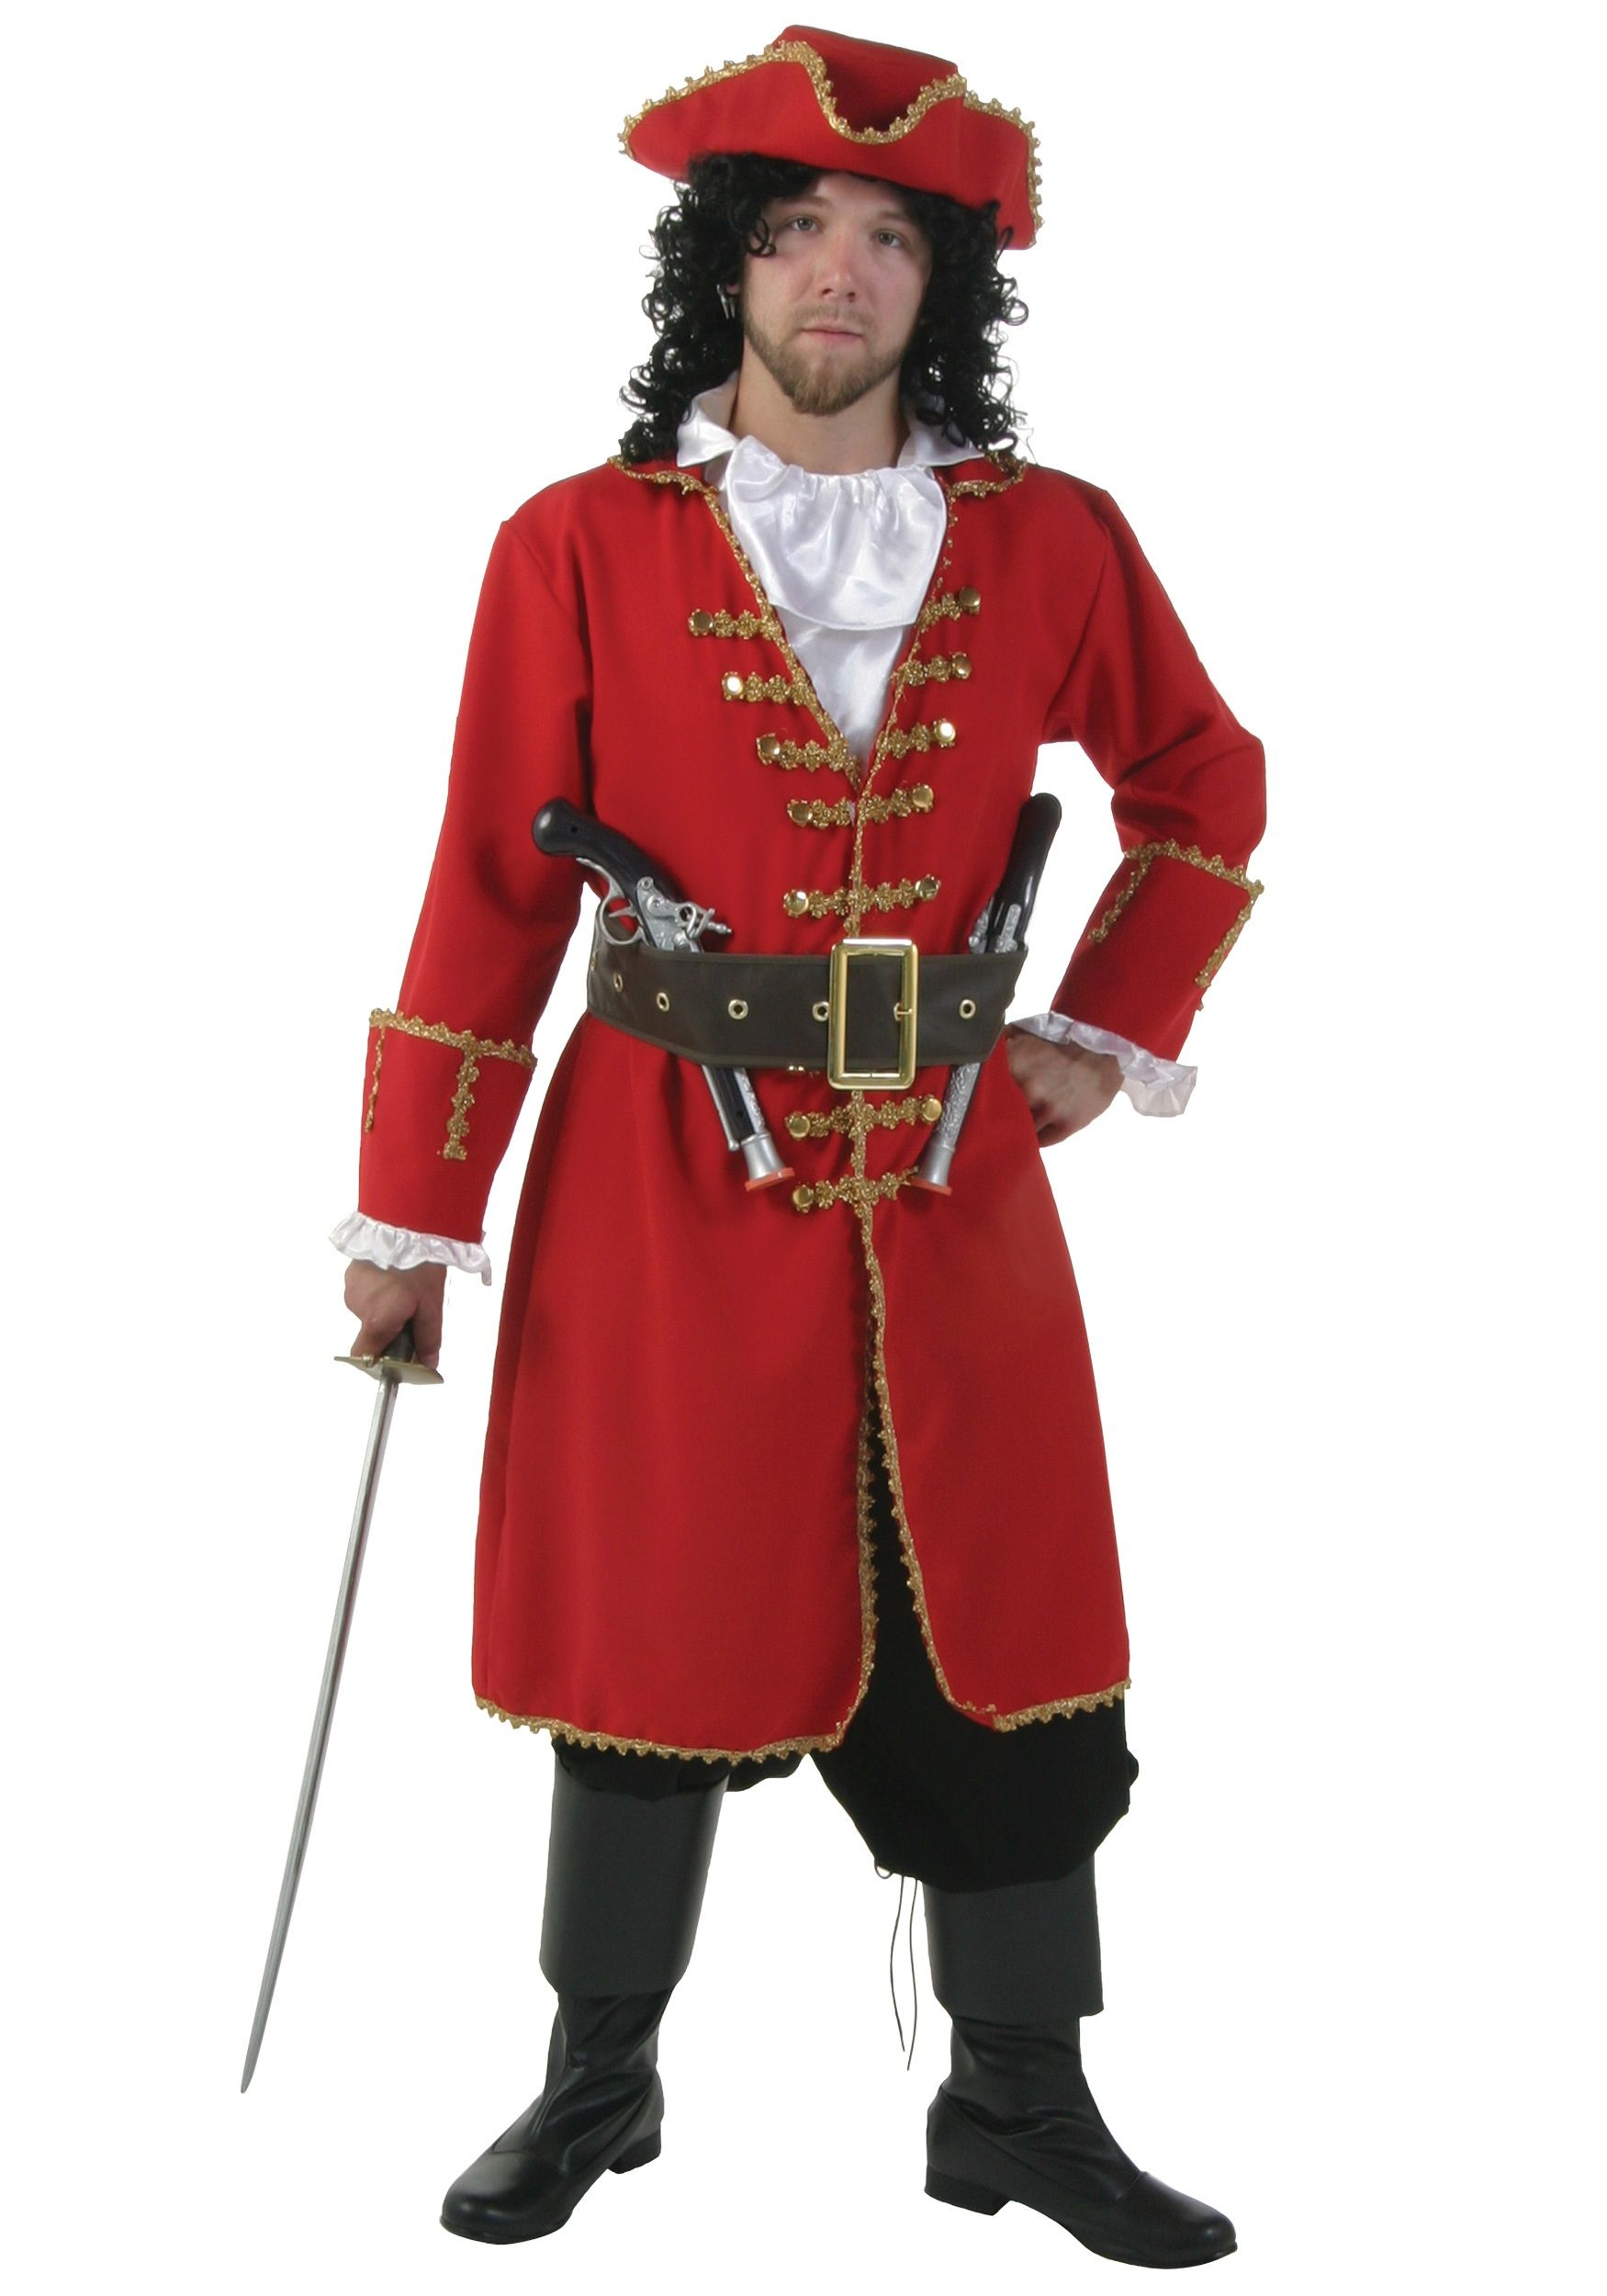 Adult Plus Size Blackheart Pirate Costume